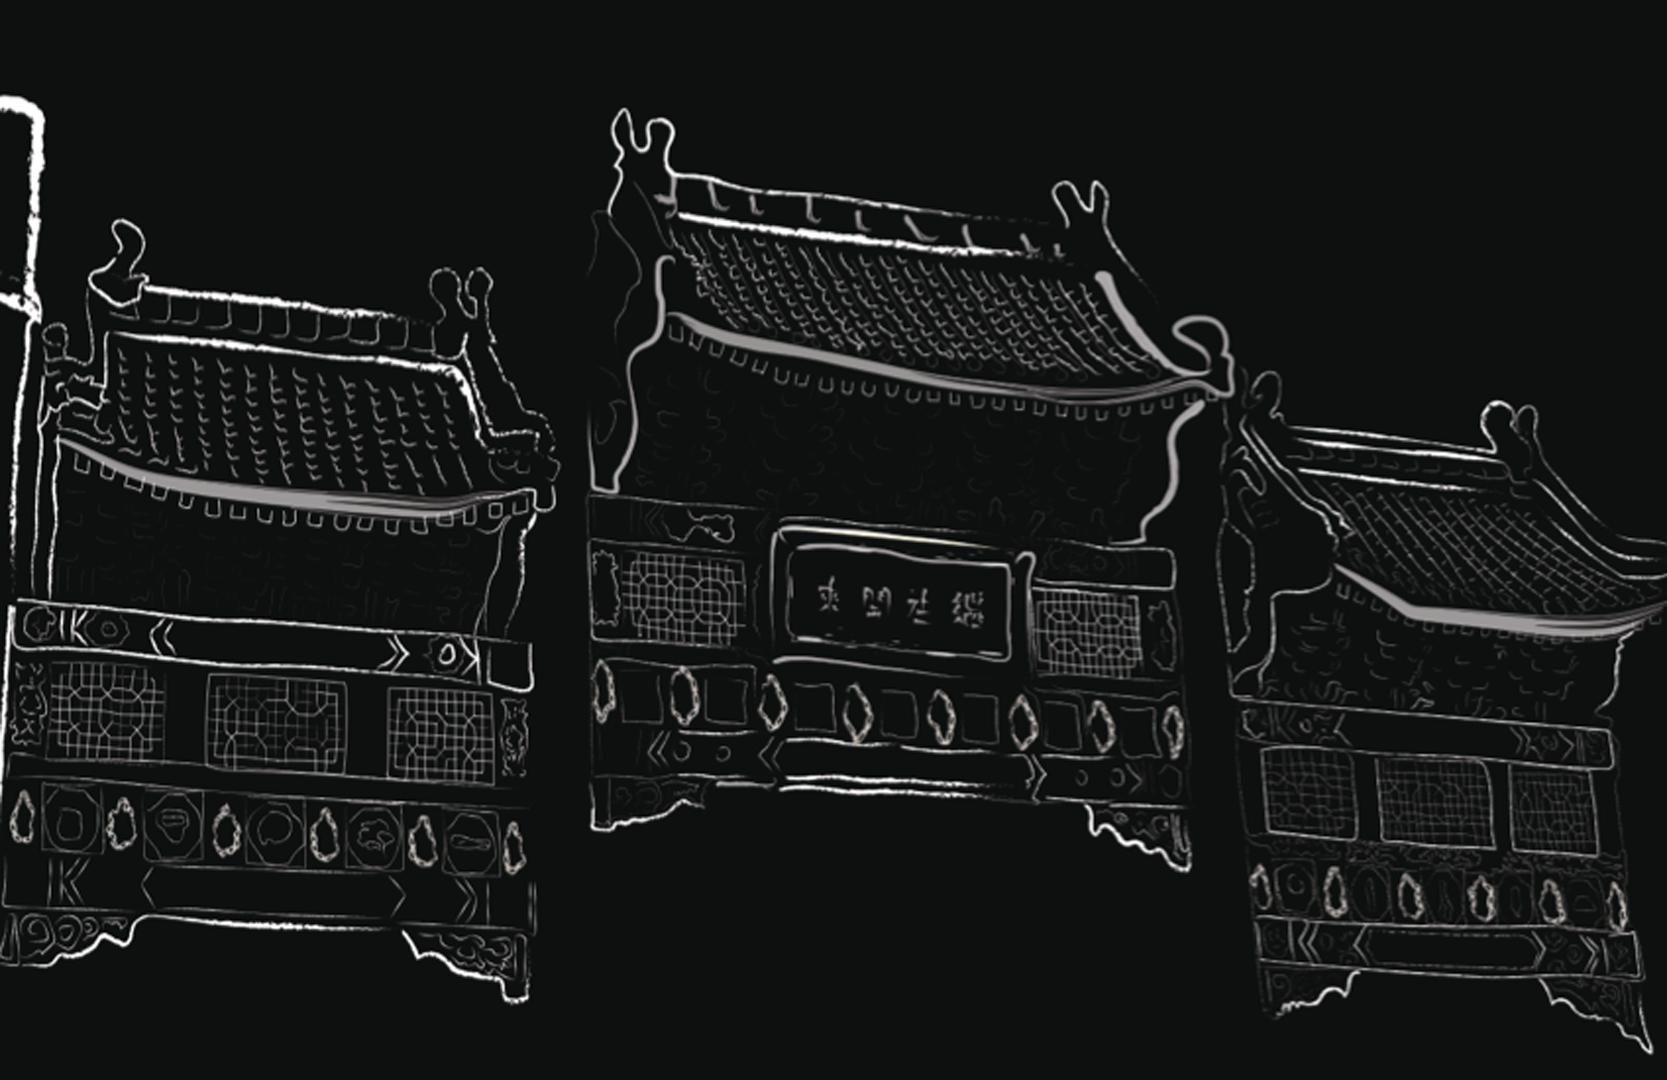 ©ISEA2016: 22nd International Symposium on Electronic Art, Judy Jheung, Heritage: Composingyou – Chinatown